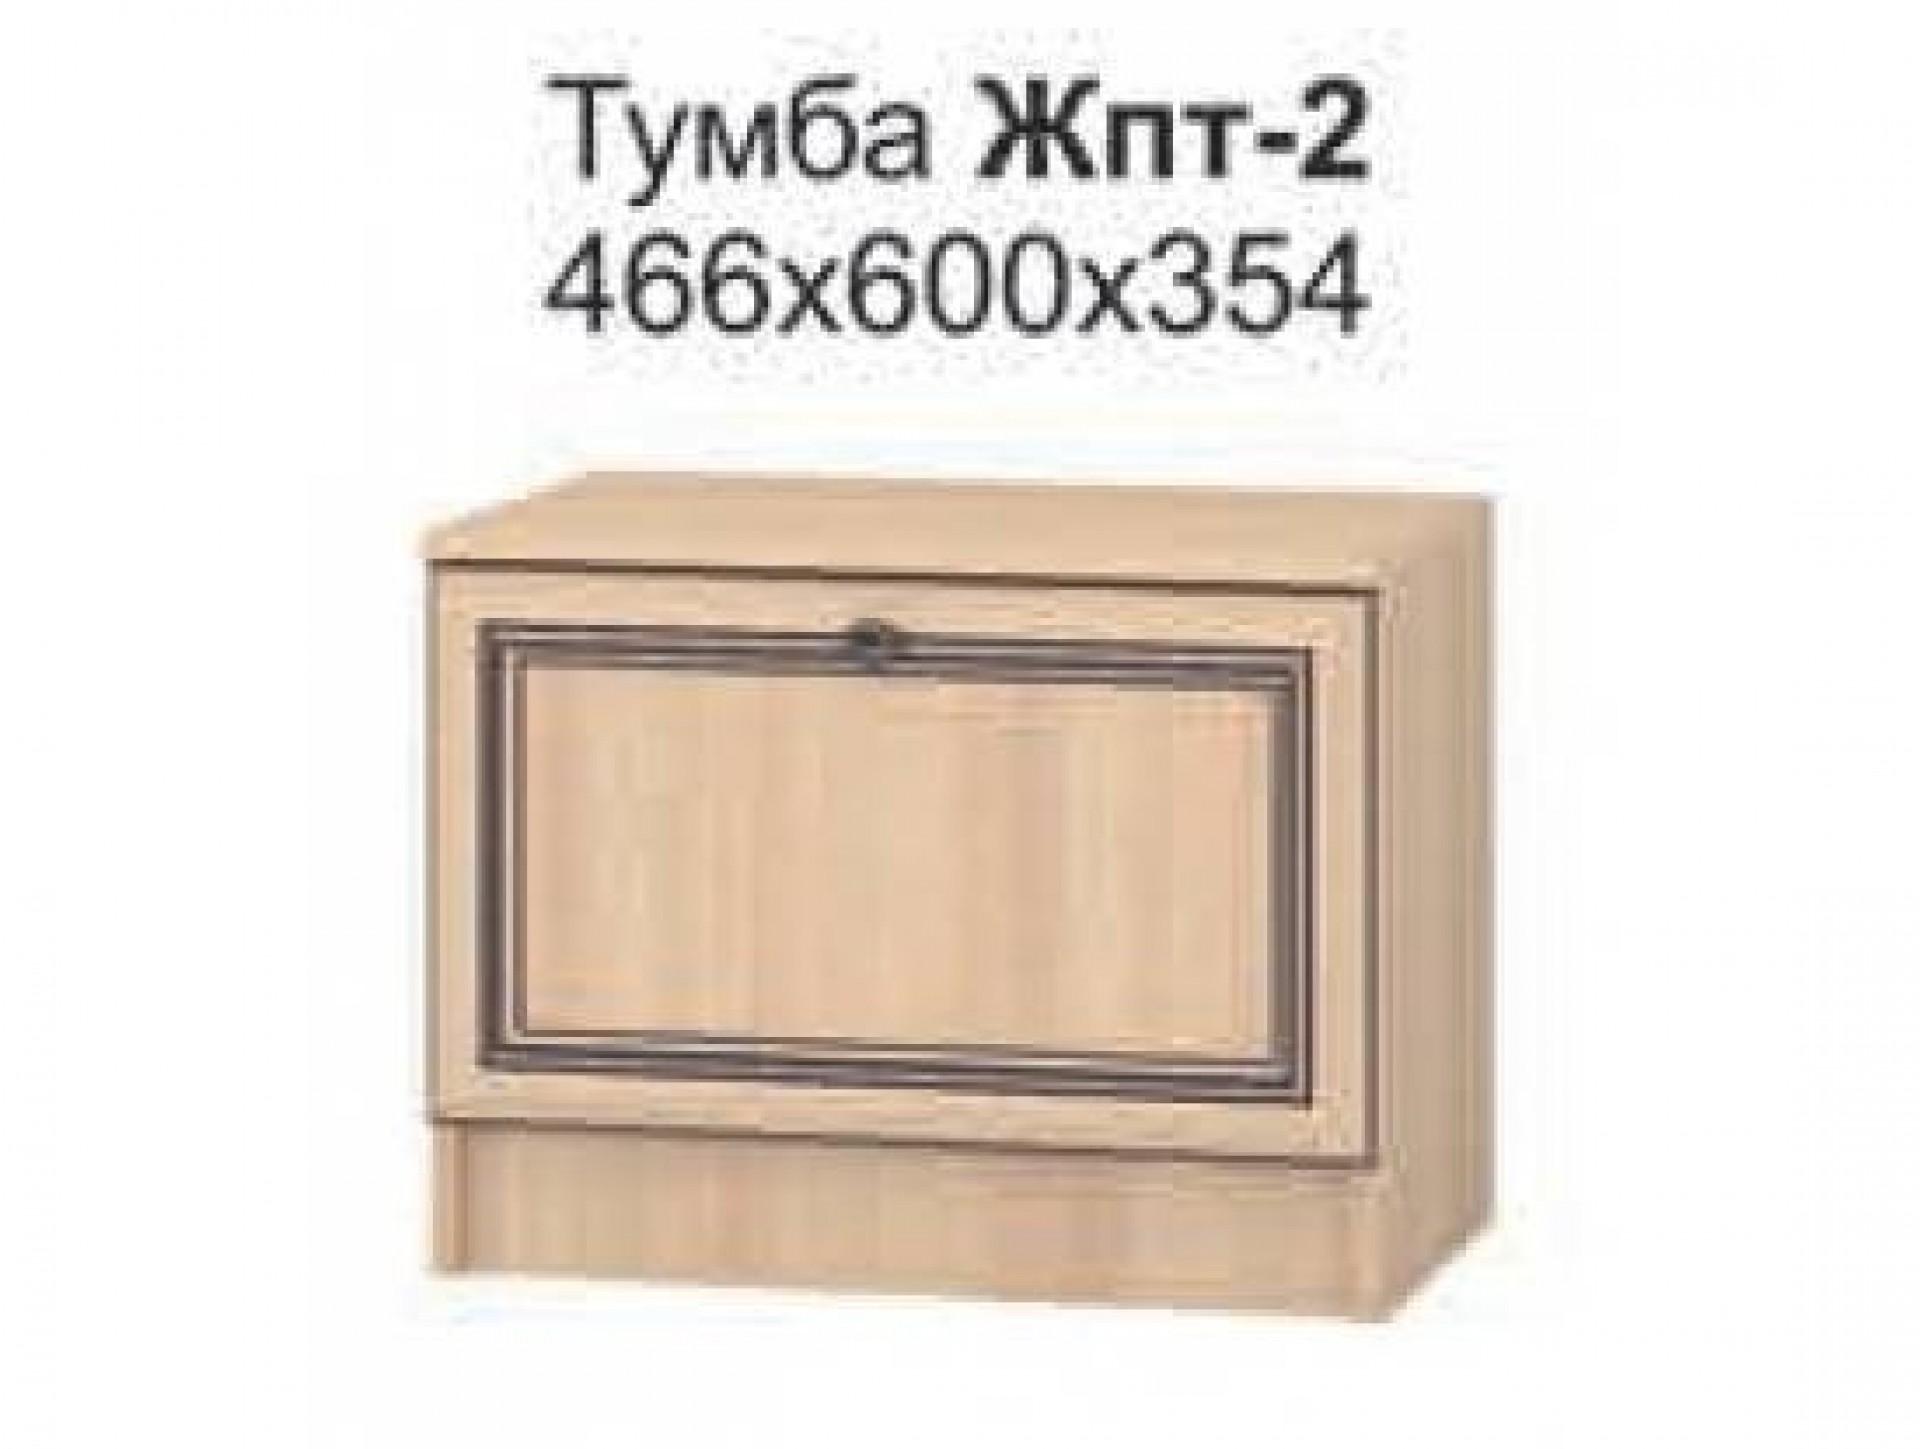 "Тумба ЖПТ-2 ""Жасмин"""